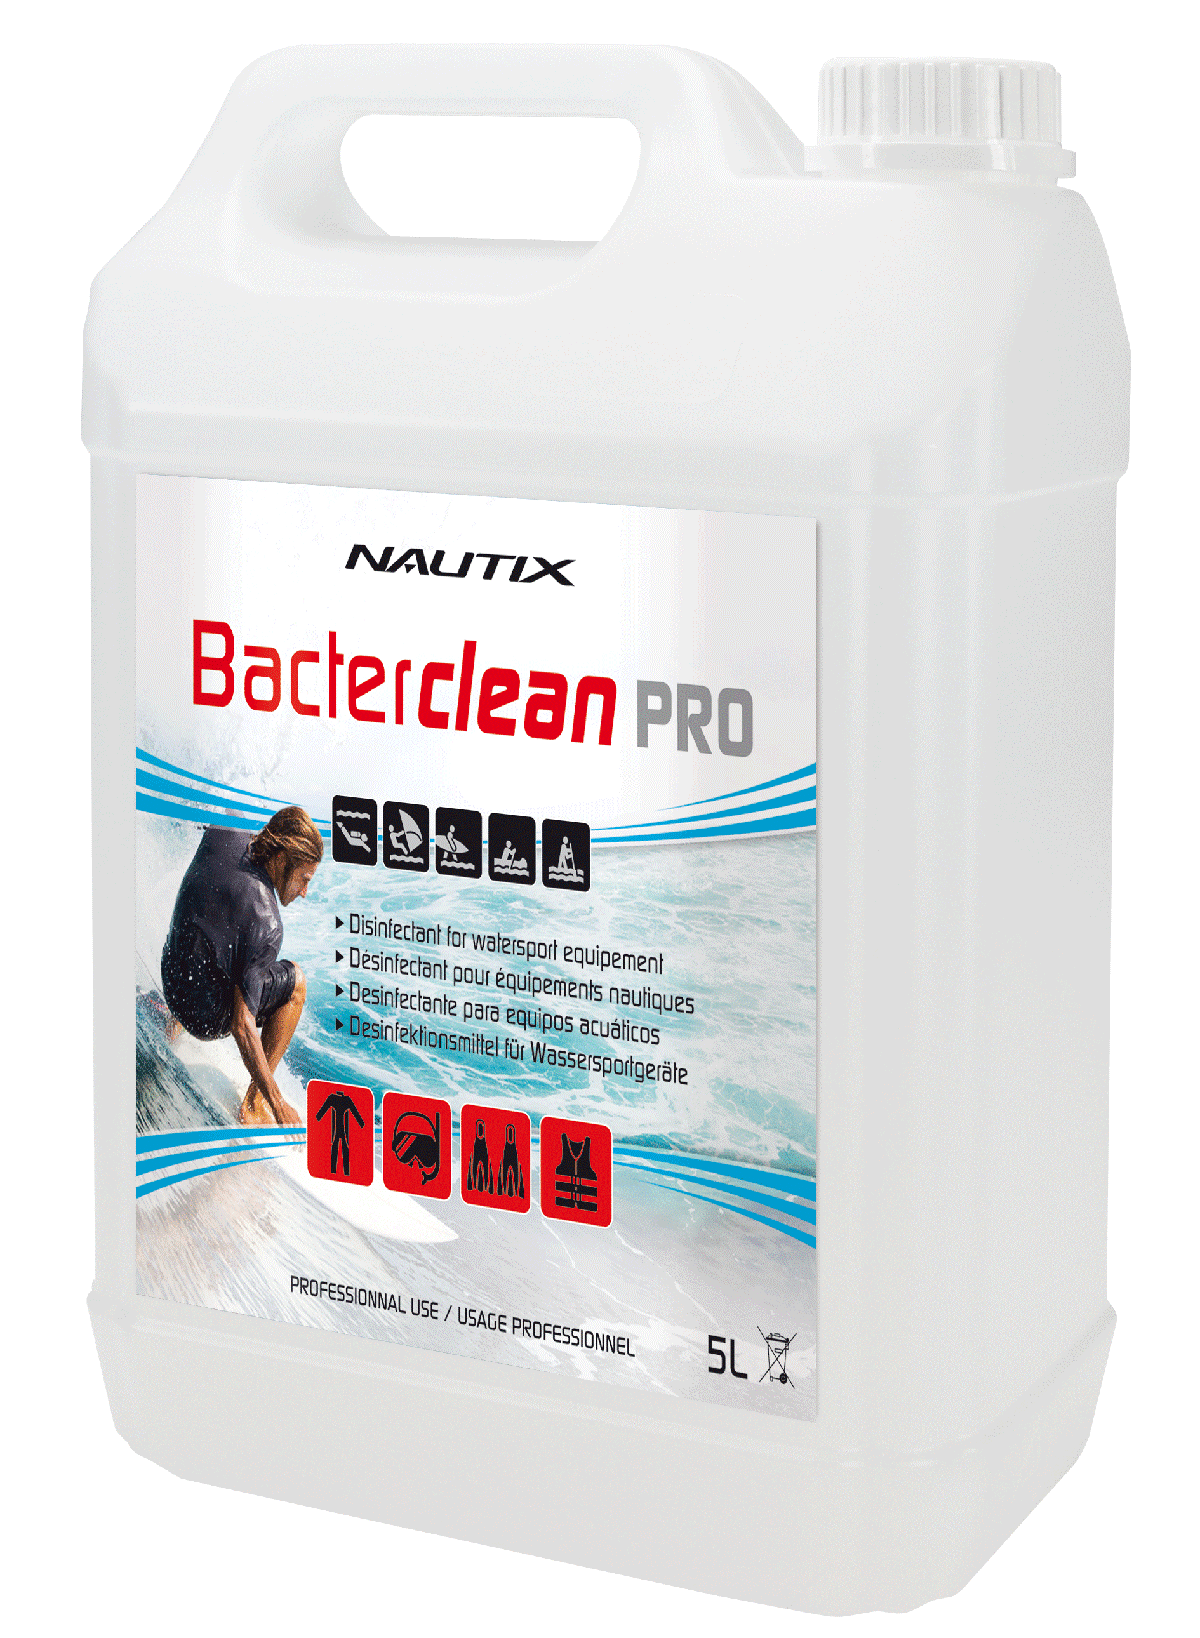 Nautix bacterclean pro 5L bidon